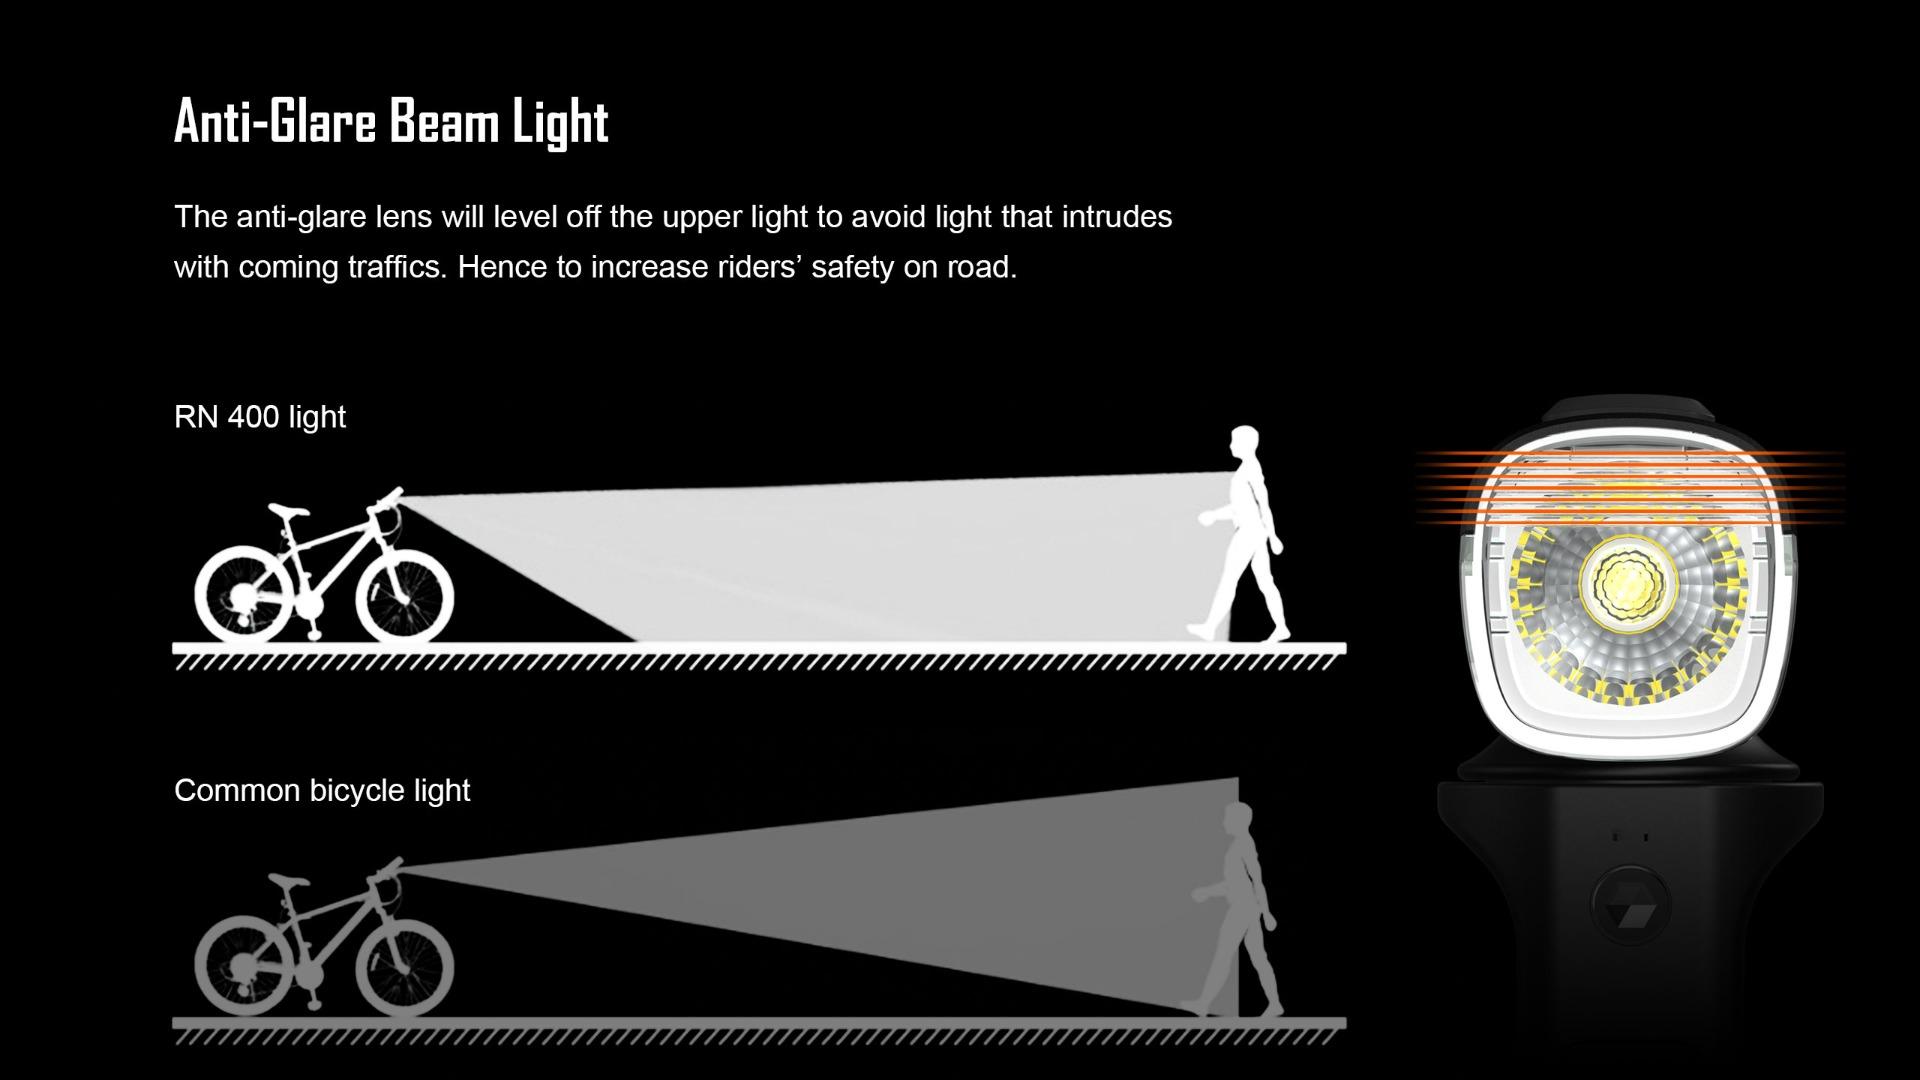 Anti-glare design of bike LED headlight